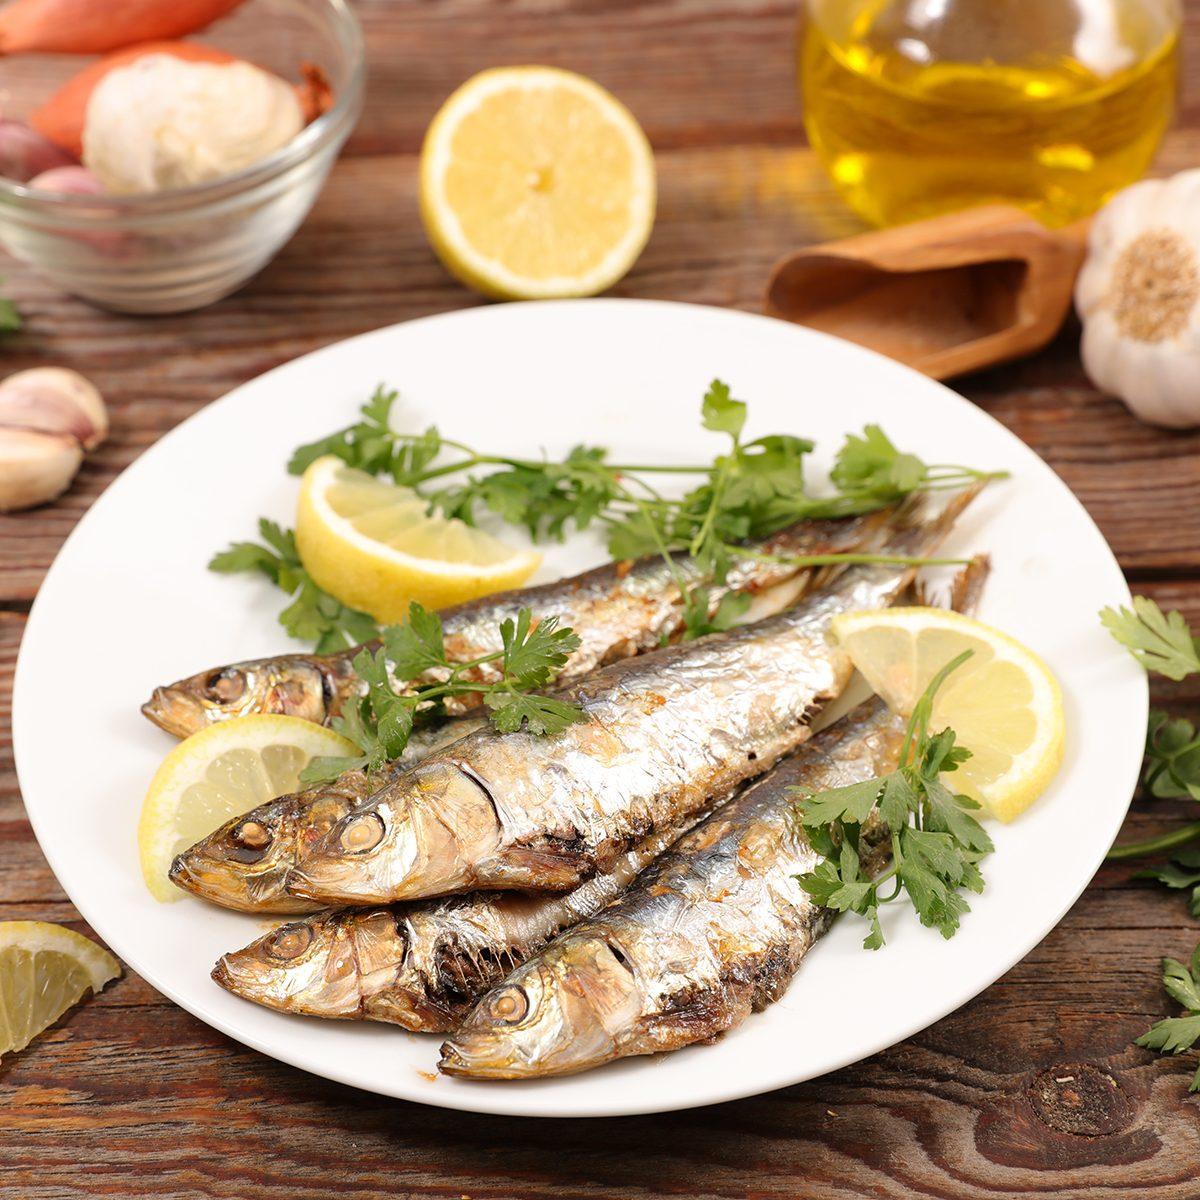 fried fish and lemon